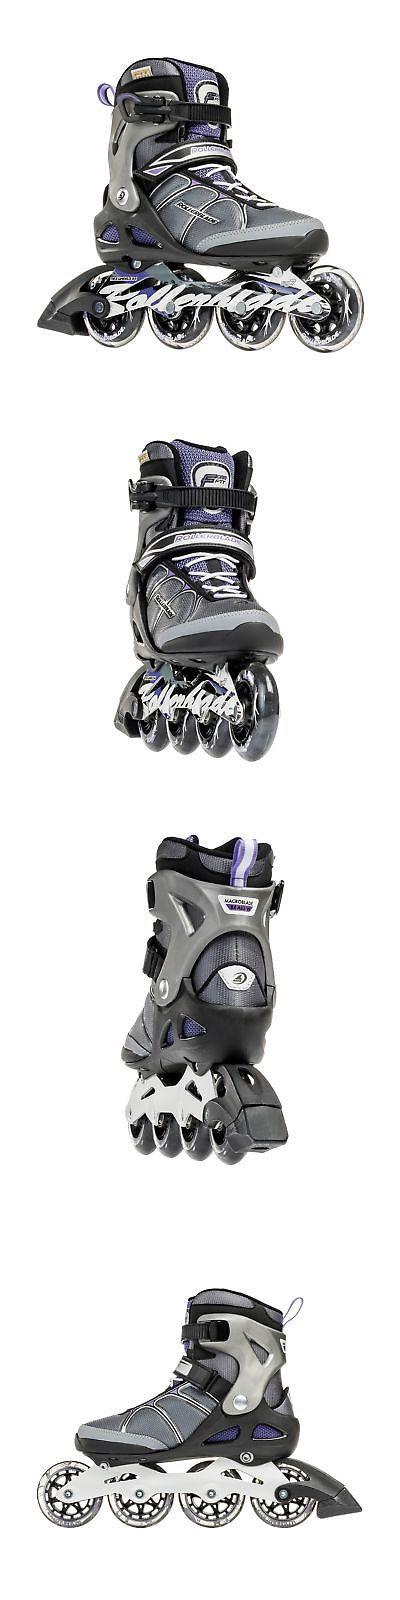 Women 16259: Rollerblade Macroblade 84W Alu 2016 Fitness Workout Skate Black Purple 9 Us -> BUY IT NOW ONLY: $232.12 on eBay!